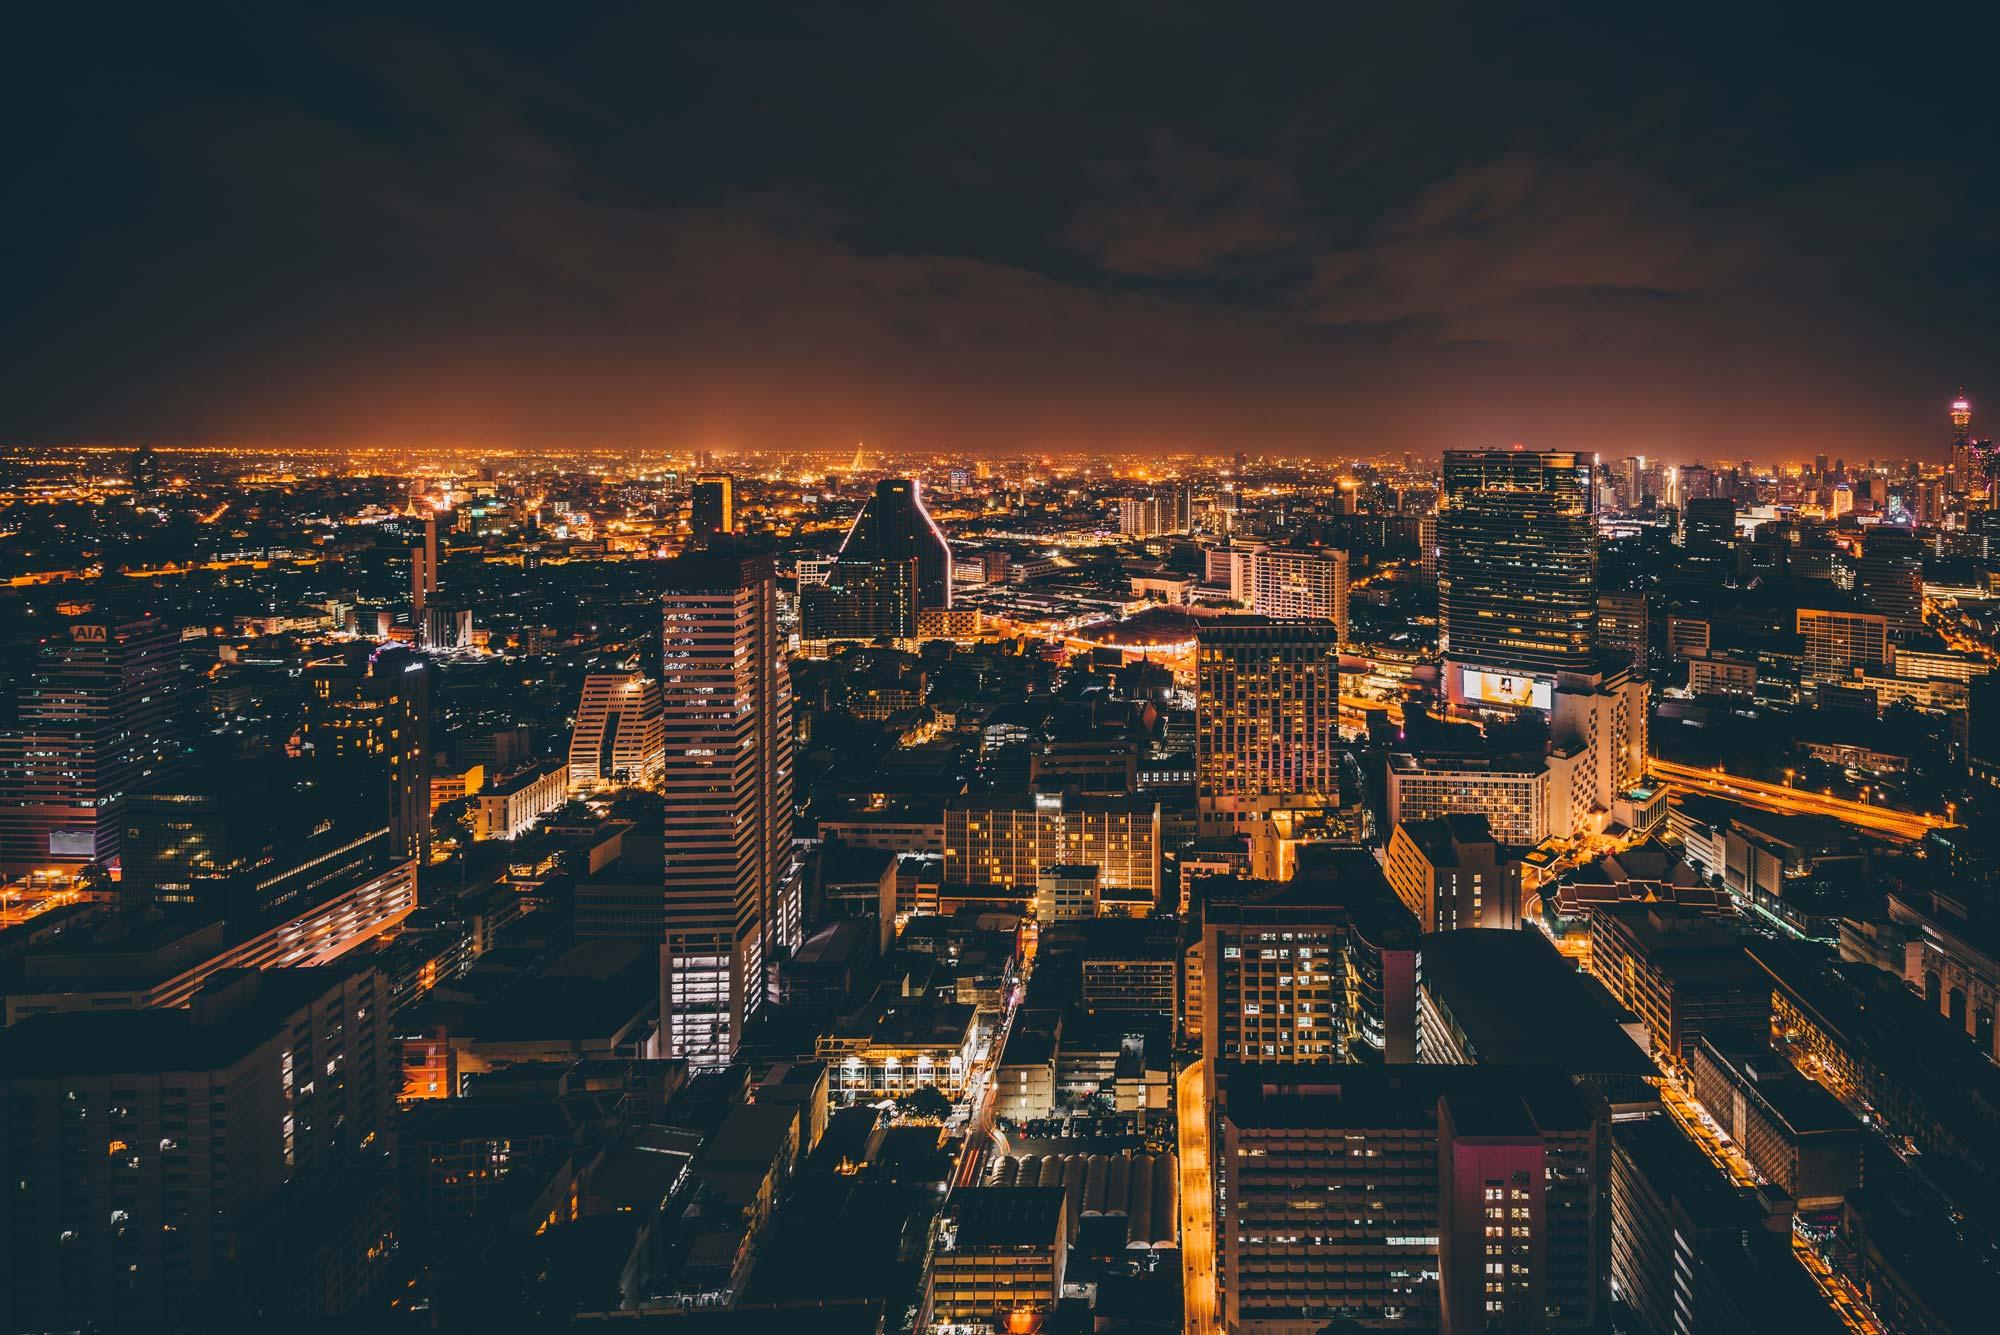 Bangkok Nightscape - A trip to explore the sleepless city of Bangkok